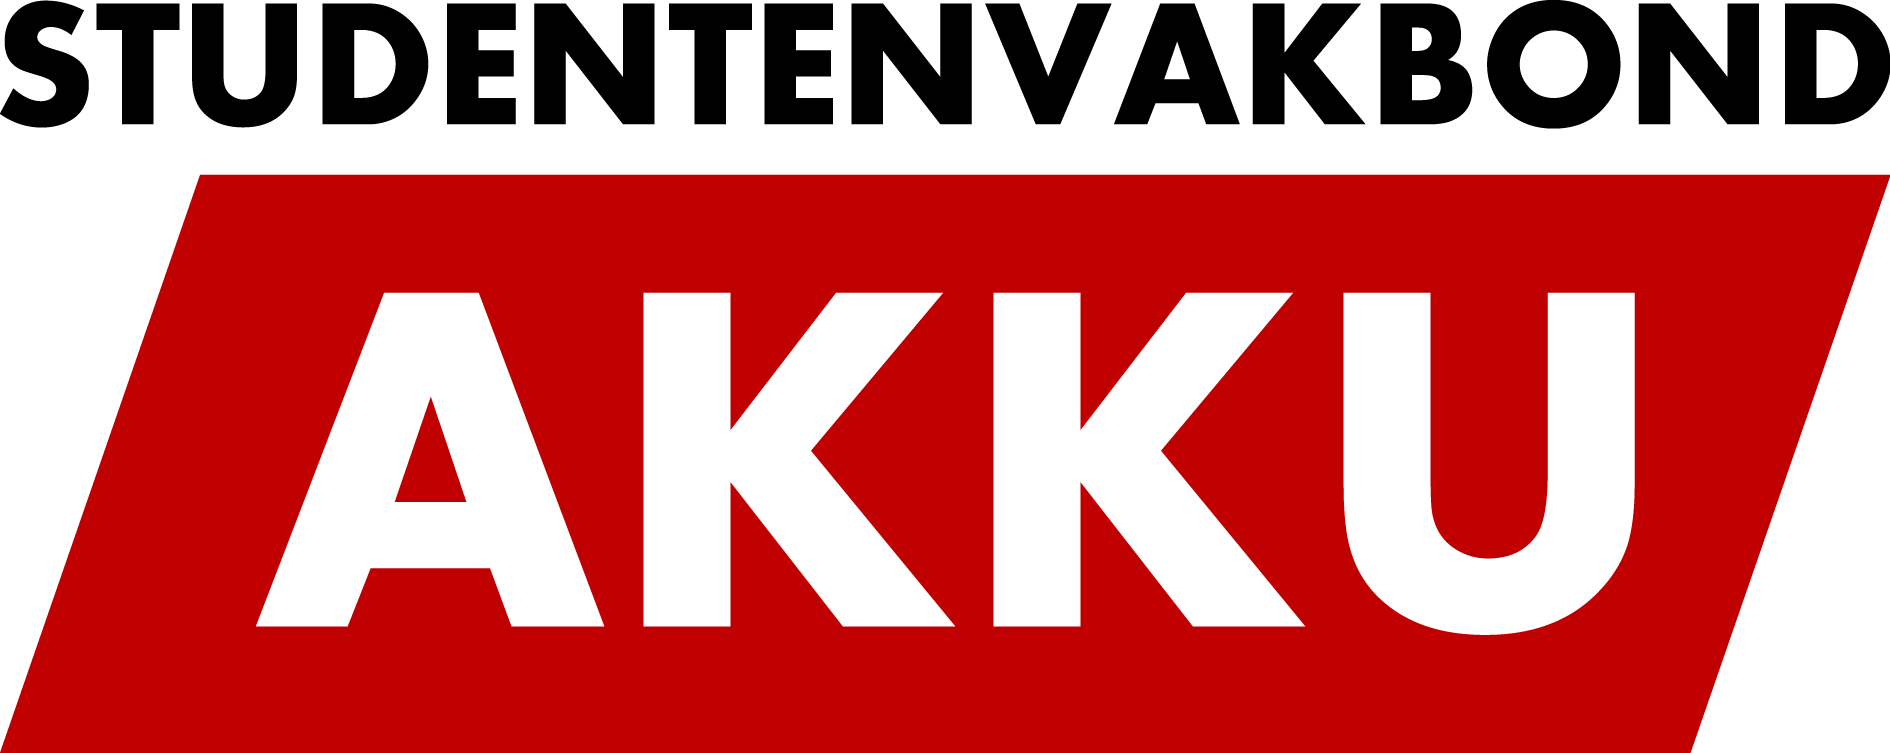 Studentenvakbond AKKU Logo